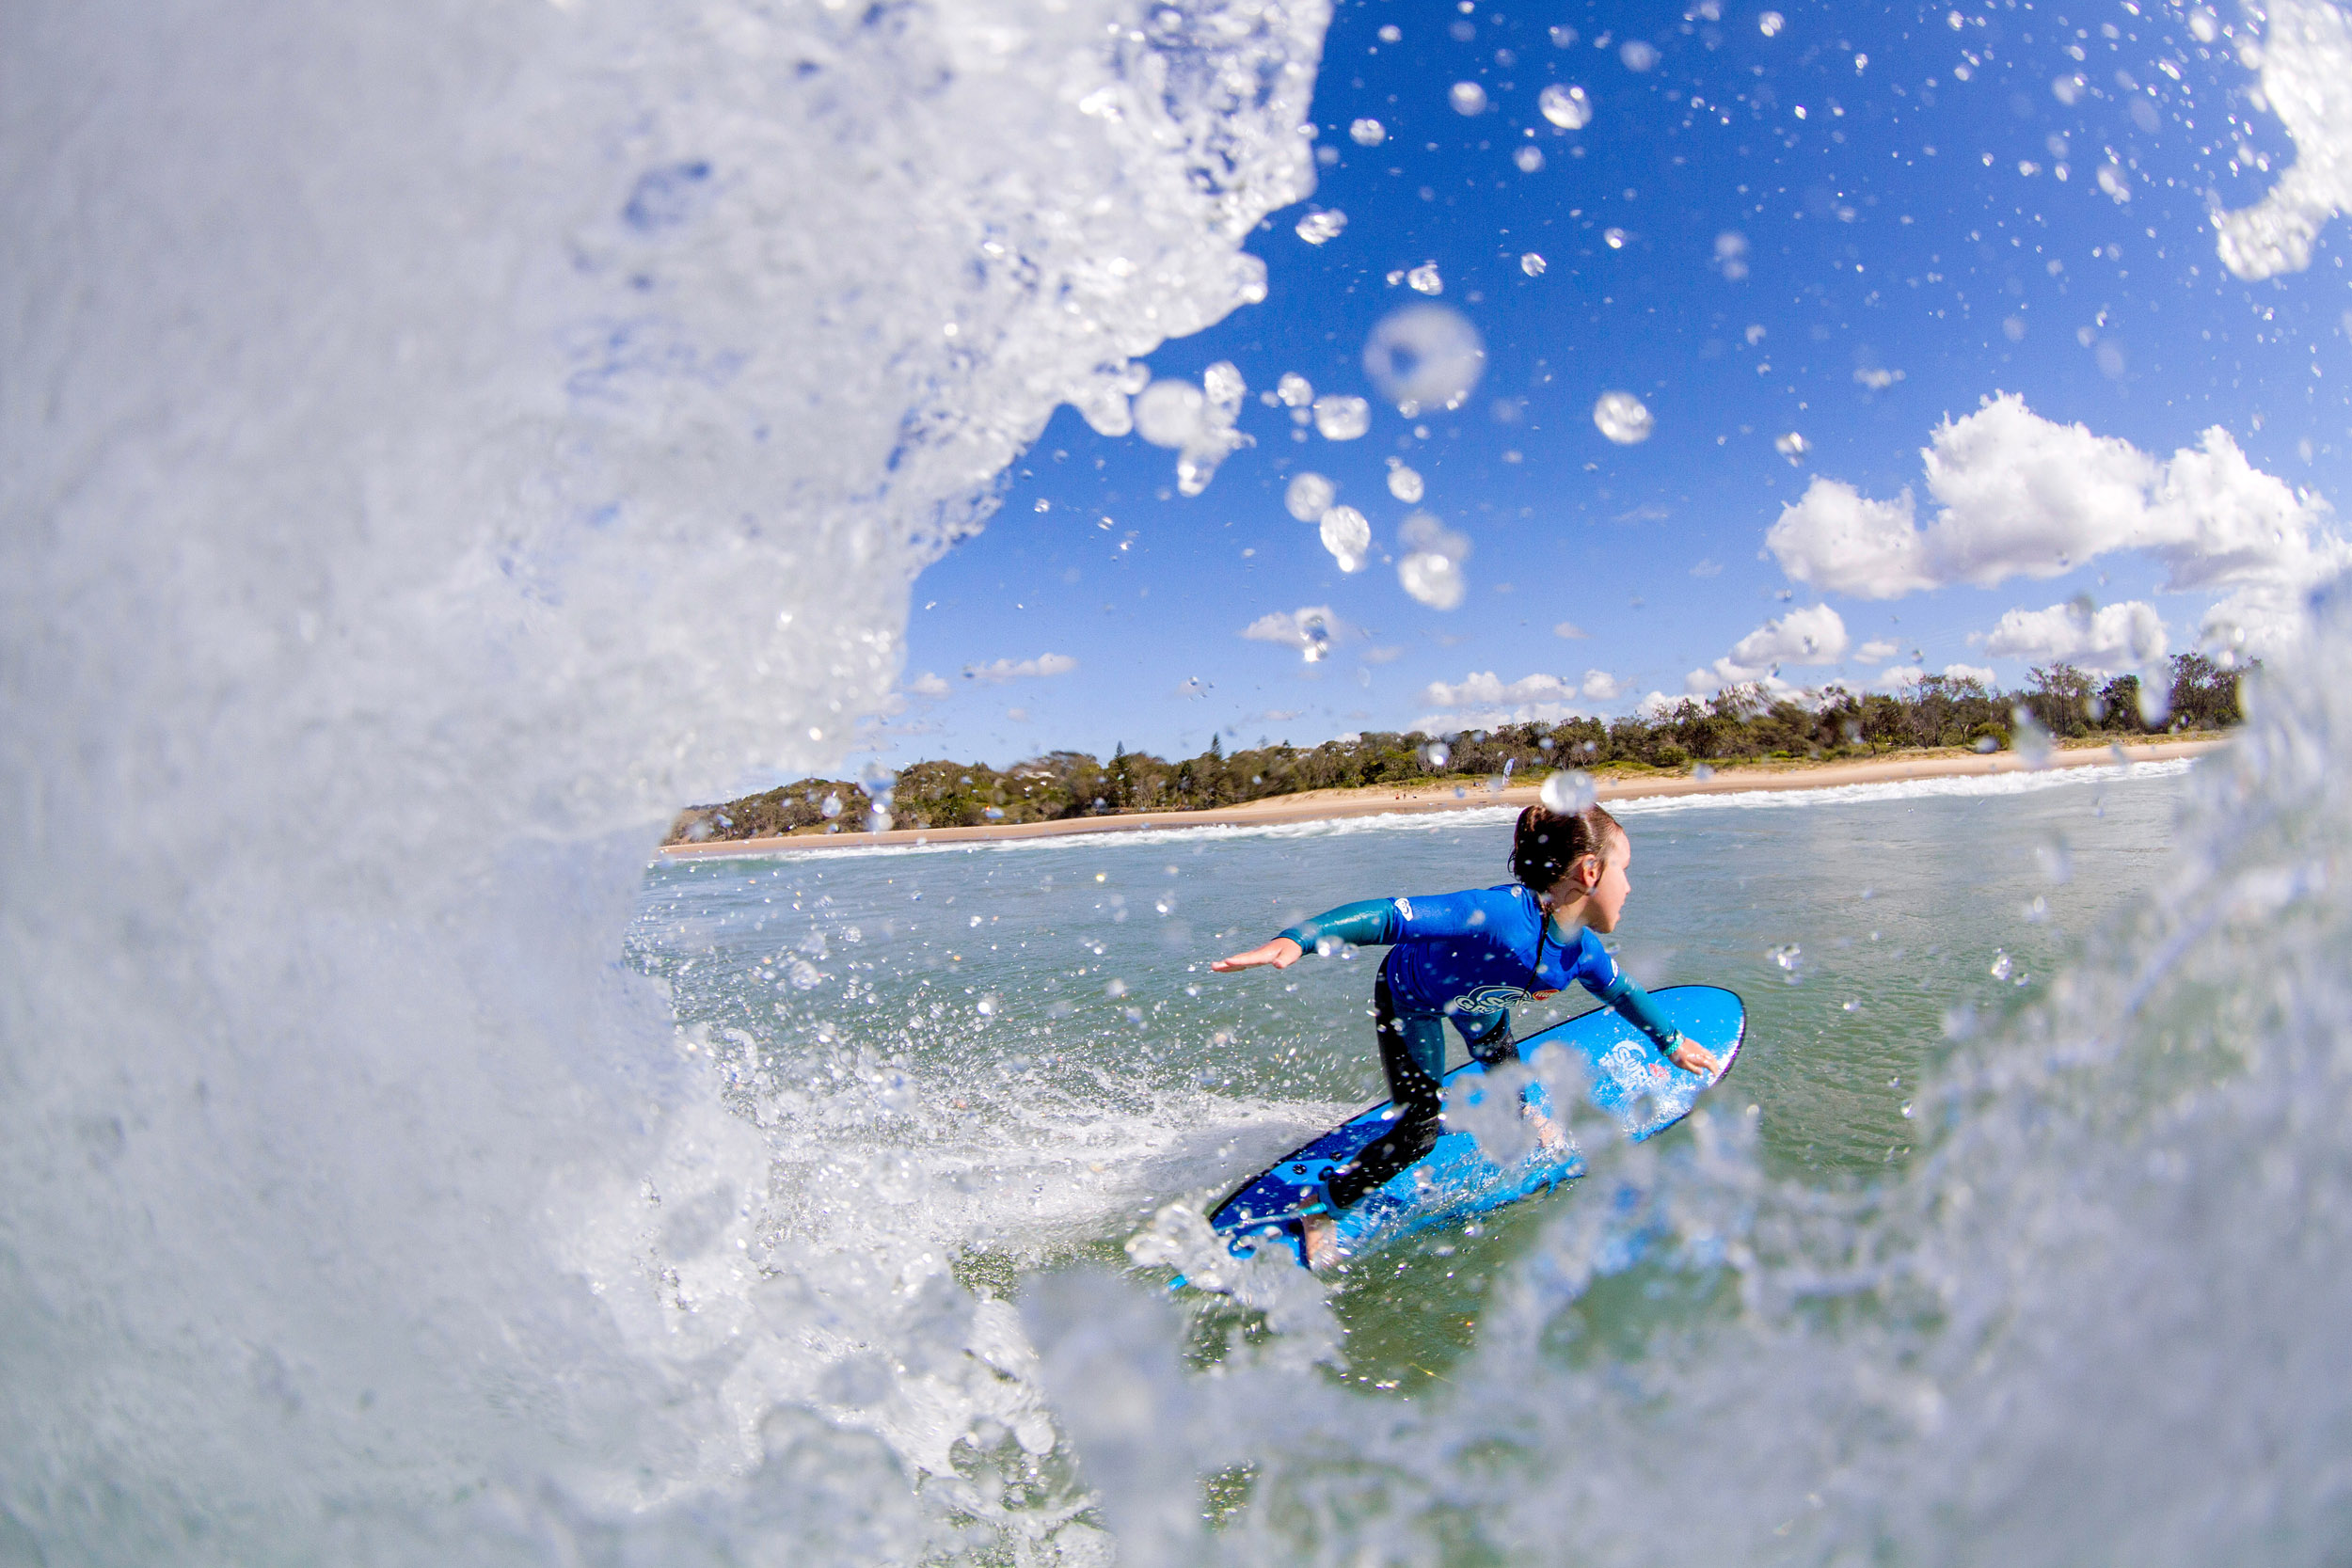 surfing-australia-surf-groms-photography-JSG-787.jpg